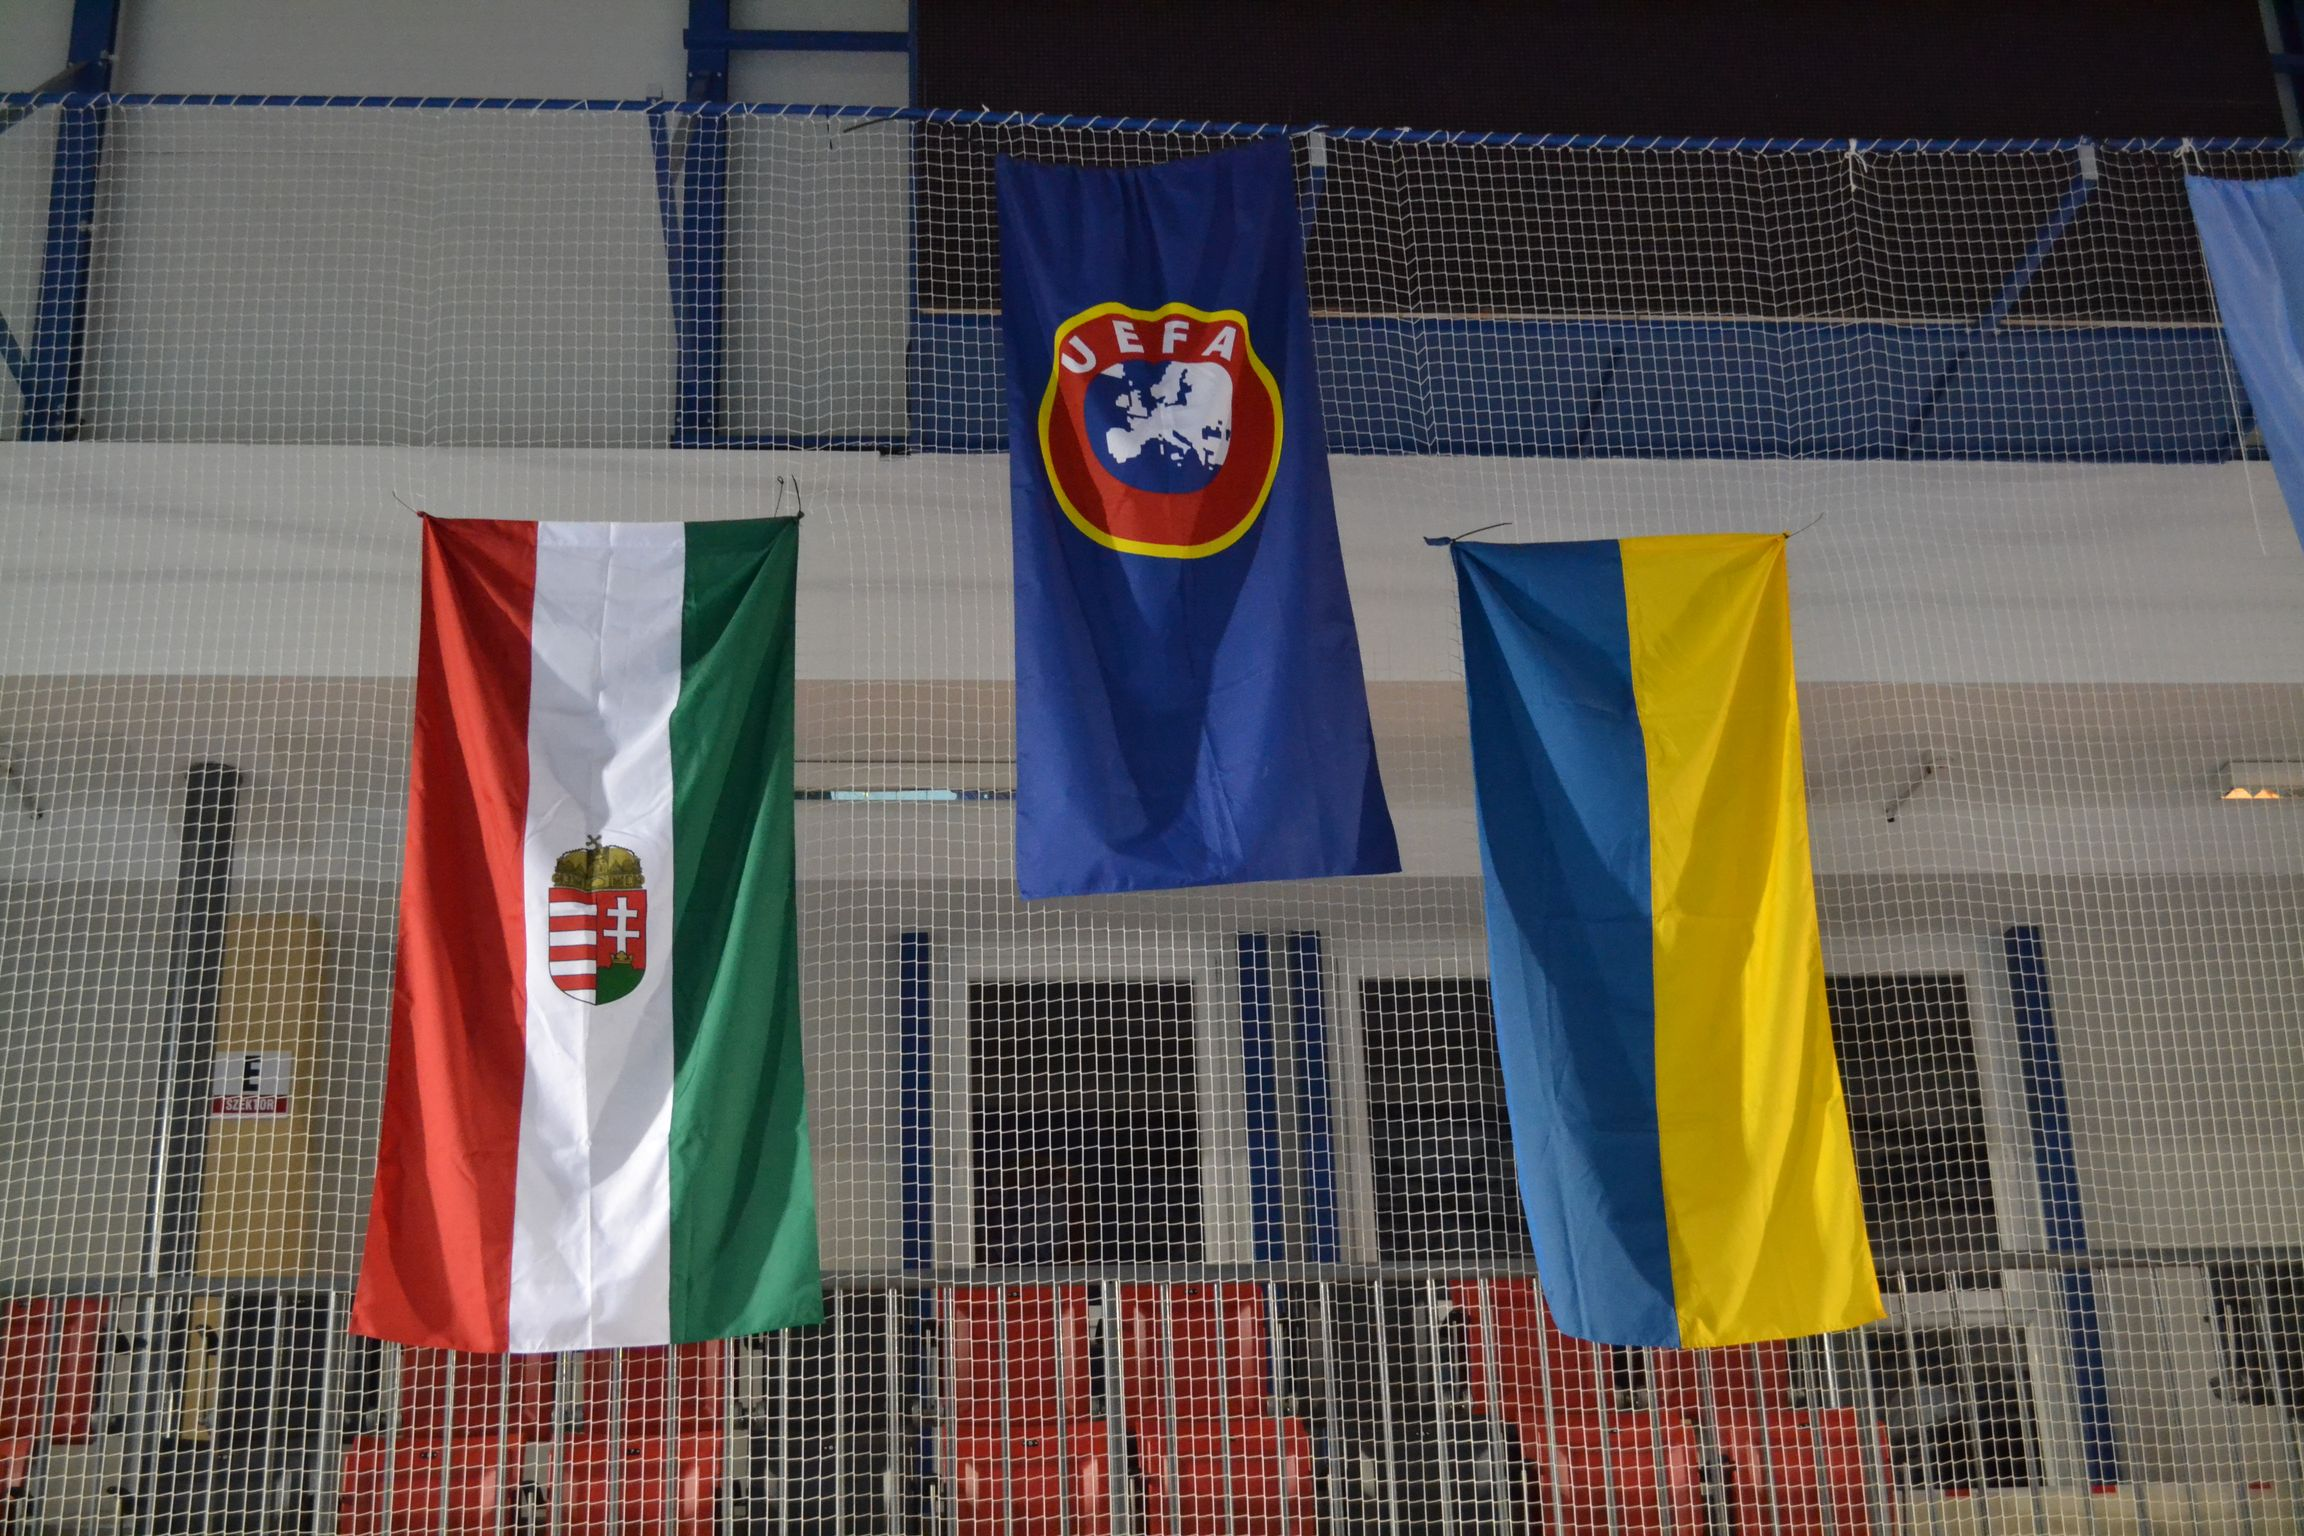 VÁLOGATOTT, женская сборная футзал, Угорщина, ФФУ, women's team Ukraine, україна, АФУ, жіноча збірна футзал, futsal, Női